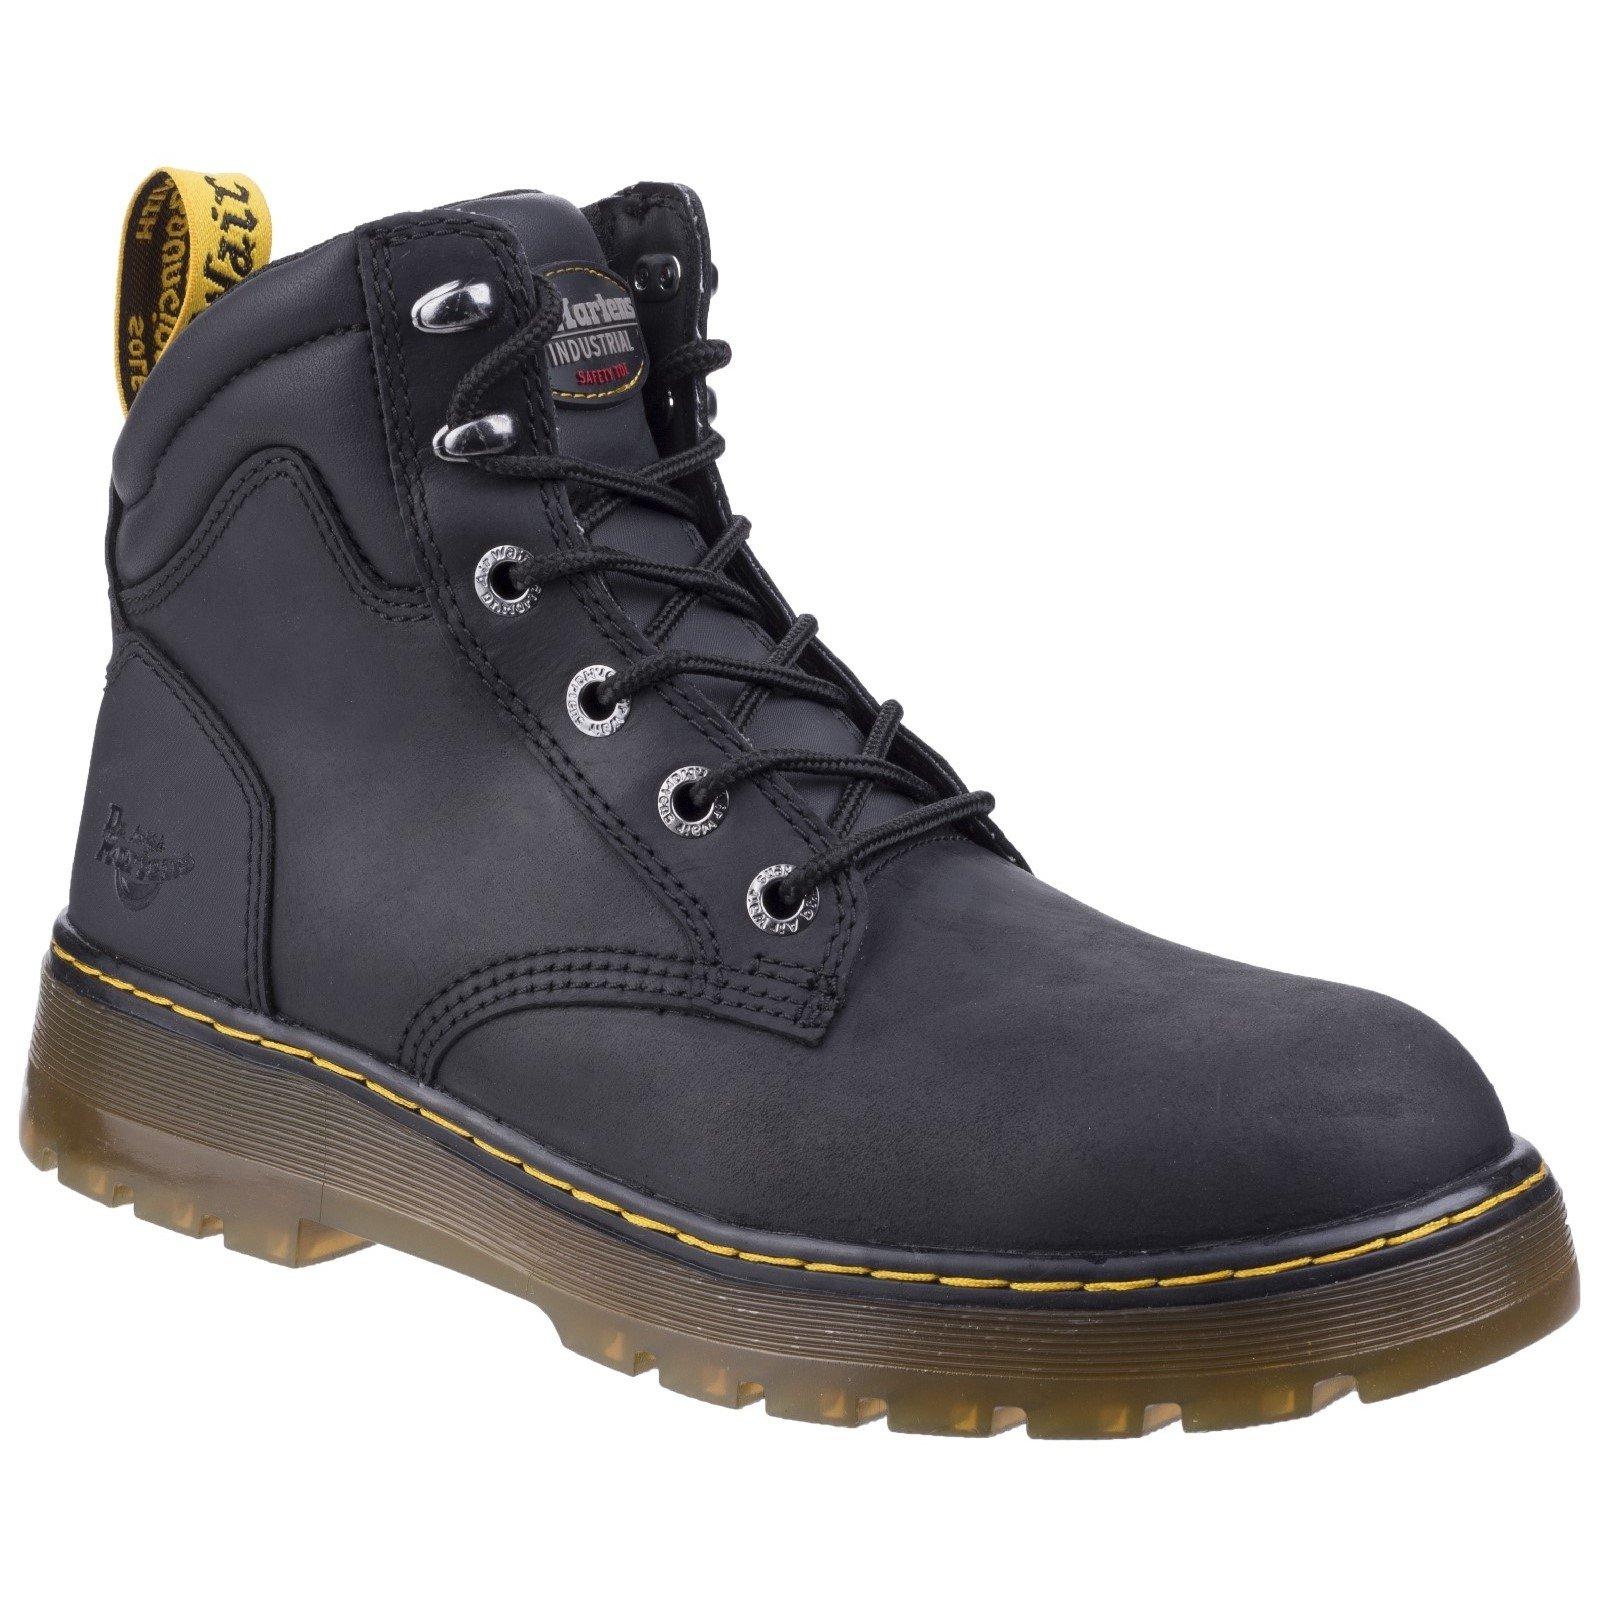 Dr Martens Unisex Brace Hiking Style Safety Boot Various Colours 27702-46606 - Black Republic 7